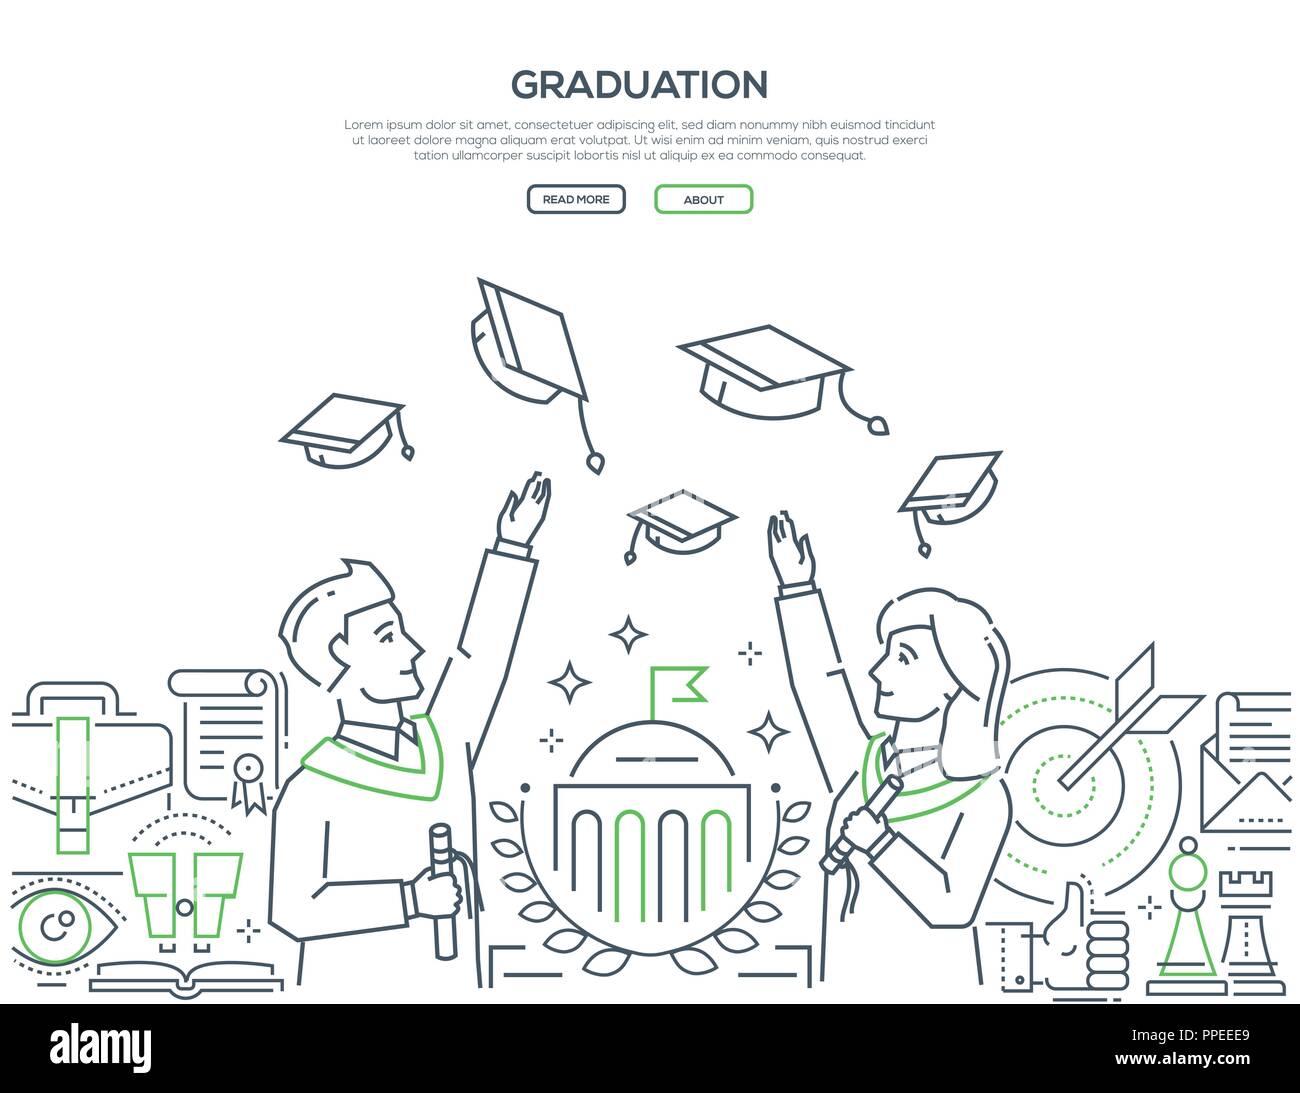 Graduation - colorful line design style web banner - Stock Image